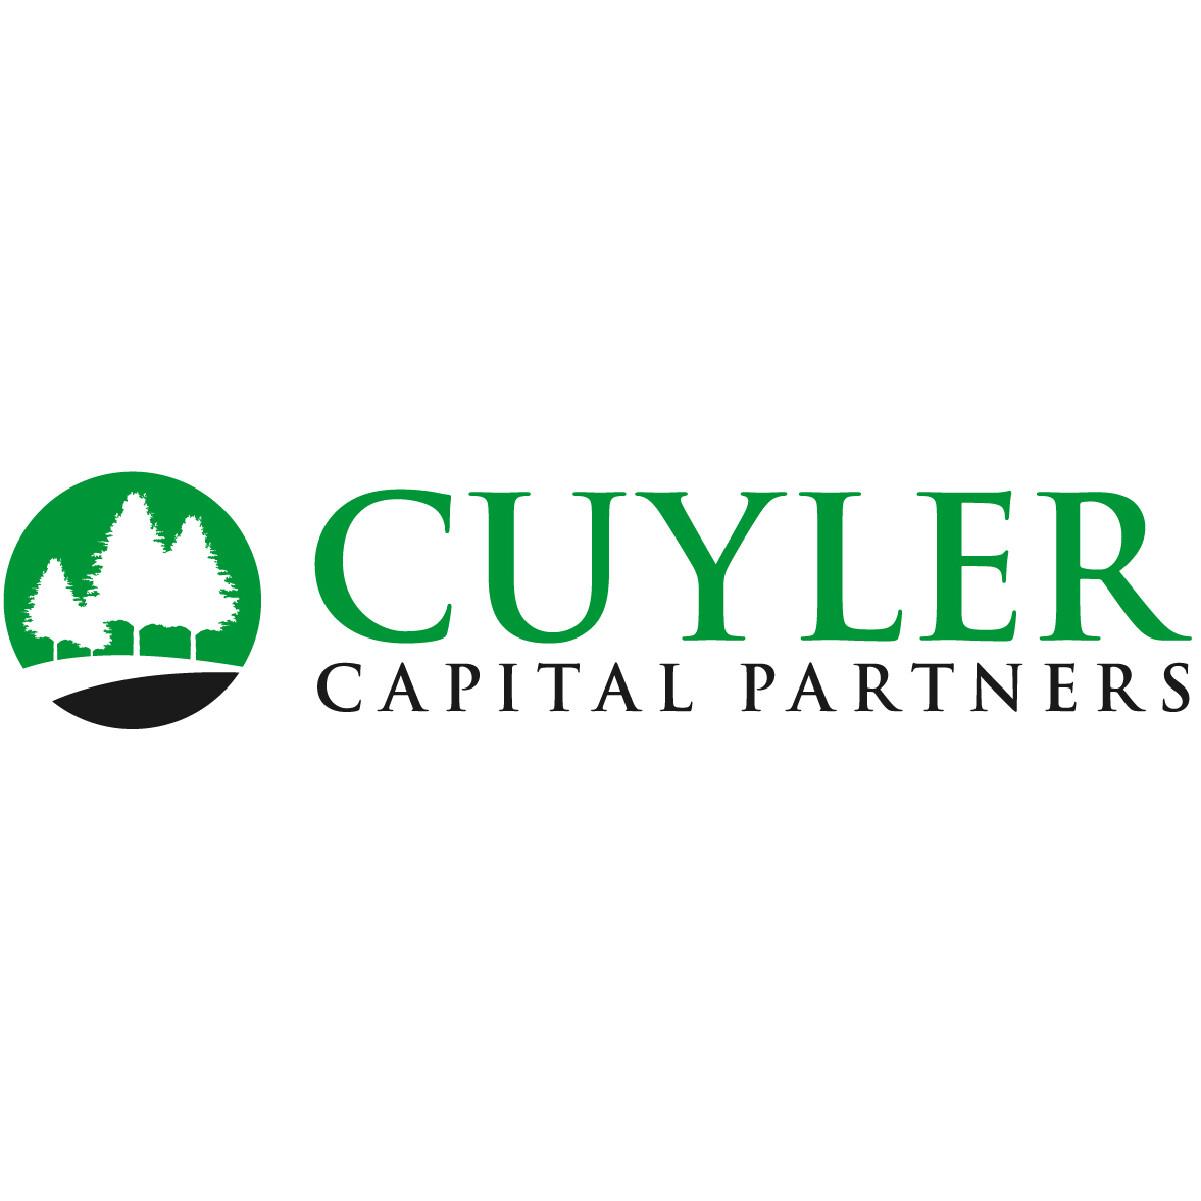 Cuyler Capital Partners